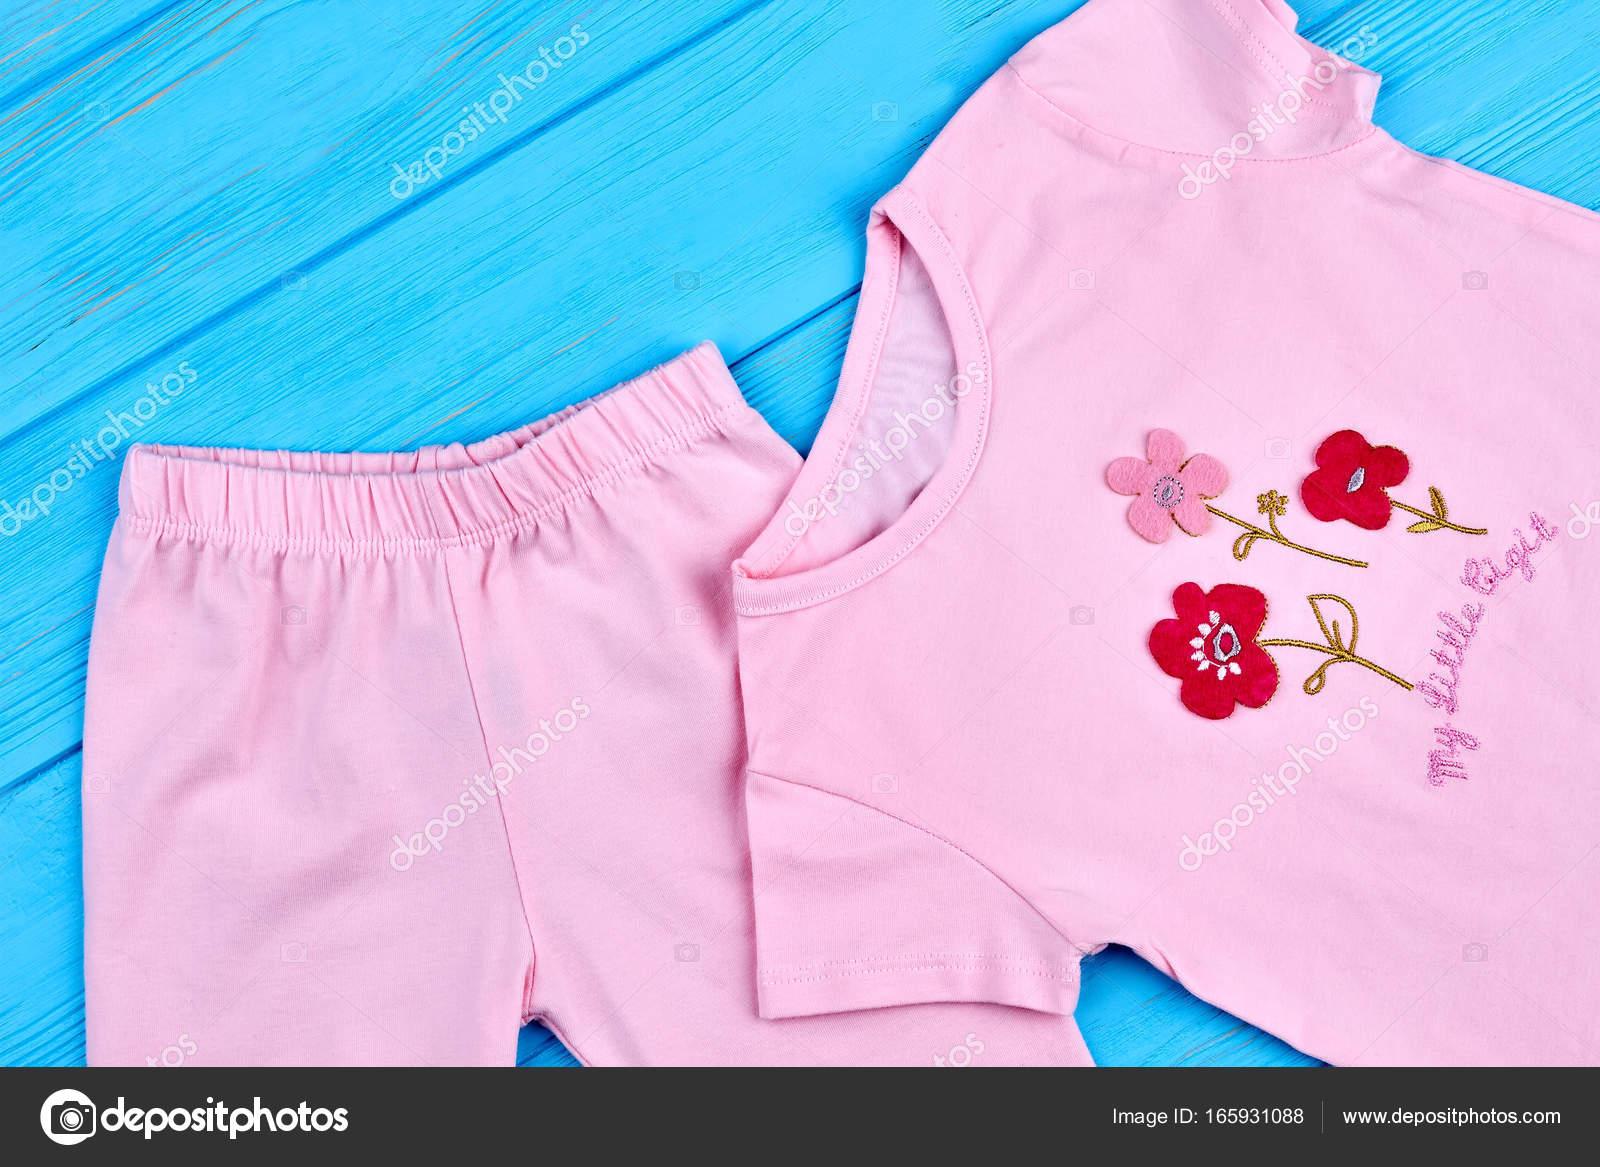 6e860462fc11 Αξιολάτρευτο βαμβάκι κοστούμι για παιδί κορίτσι. Βιολογικά κολάν και  μπλουζάκι για κοριτσάκι. Κινούμενα σχέδια τυπωμένα ροζ baby t-shirt —  Εικόνα από ...